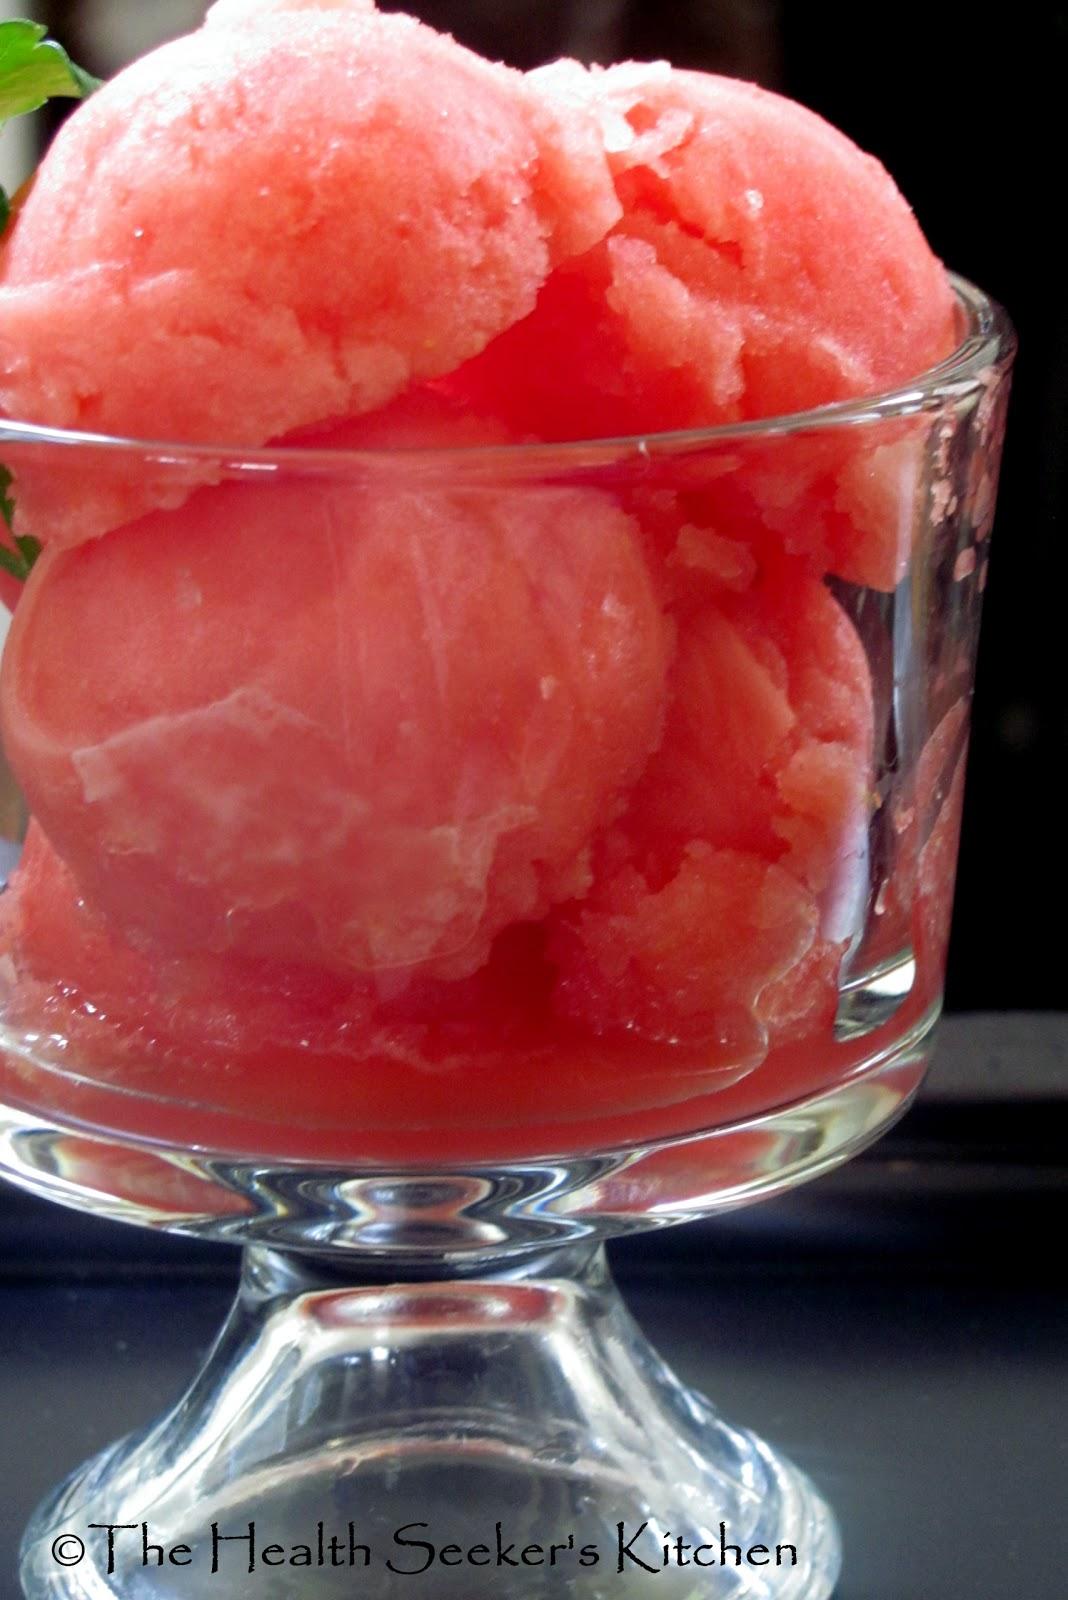 The Health Seekers Kitchen: Raw Watermelon Italian Ice